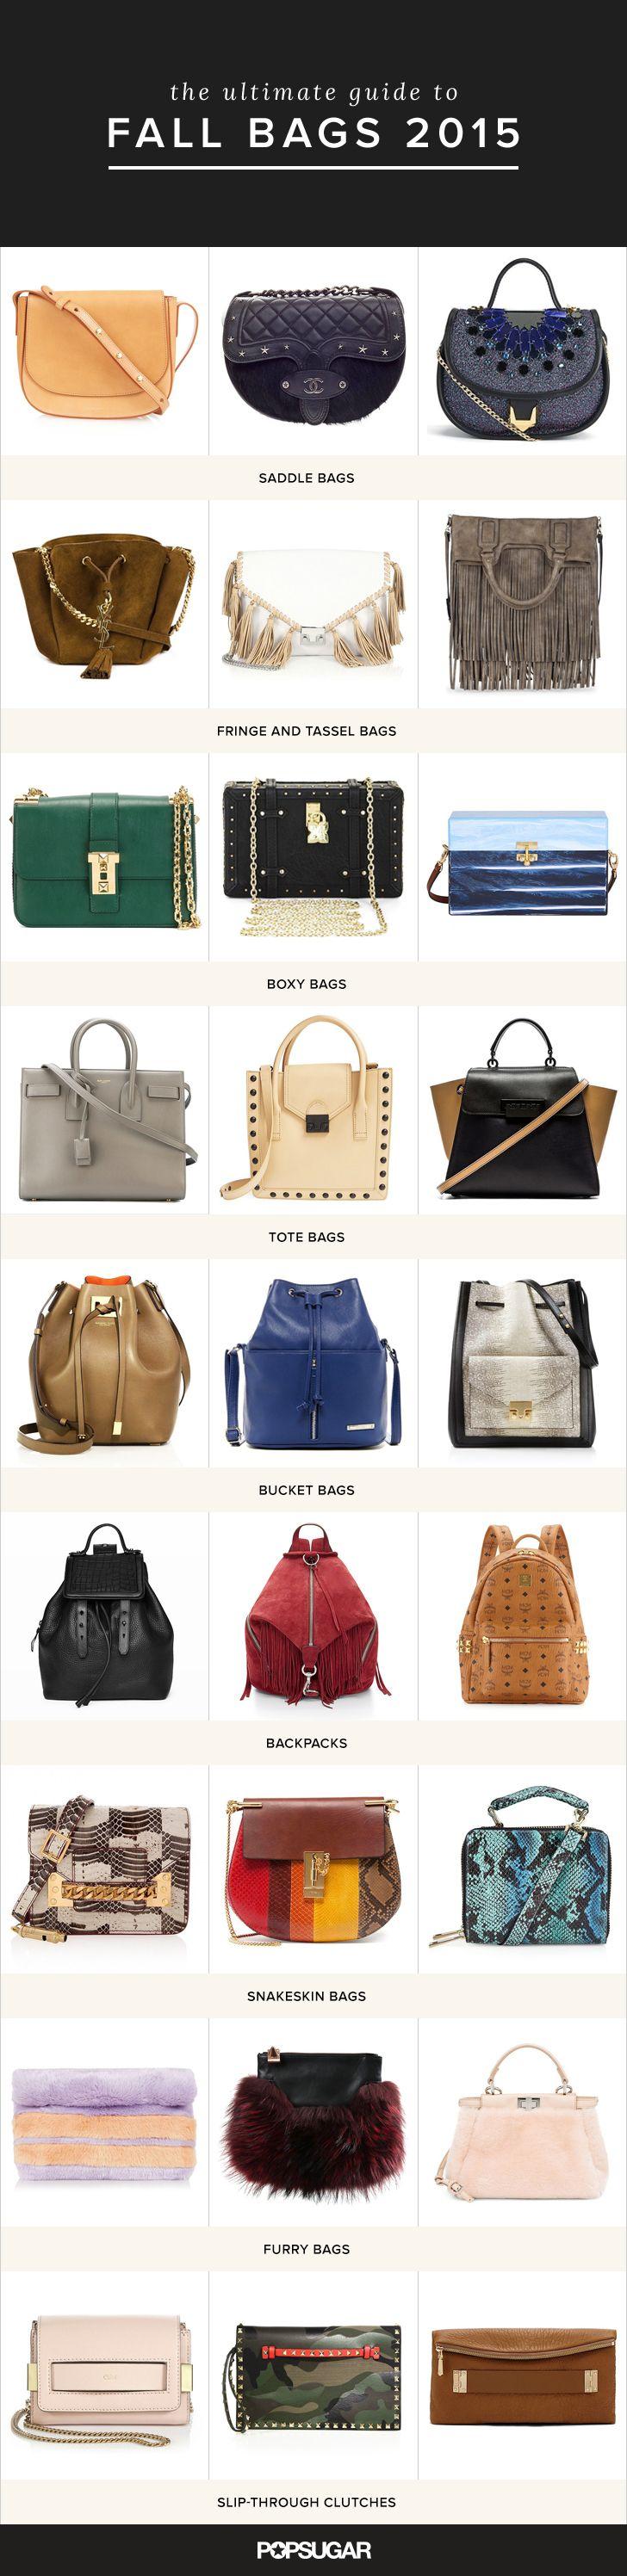 The Ultimate Guide to Fall Handbags – Jennie Kruzlic